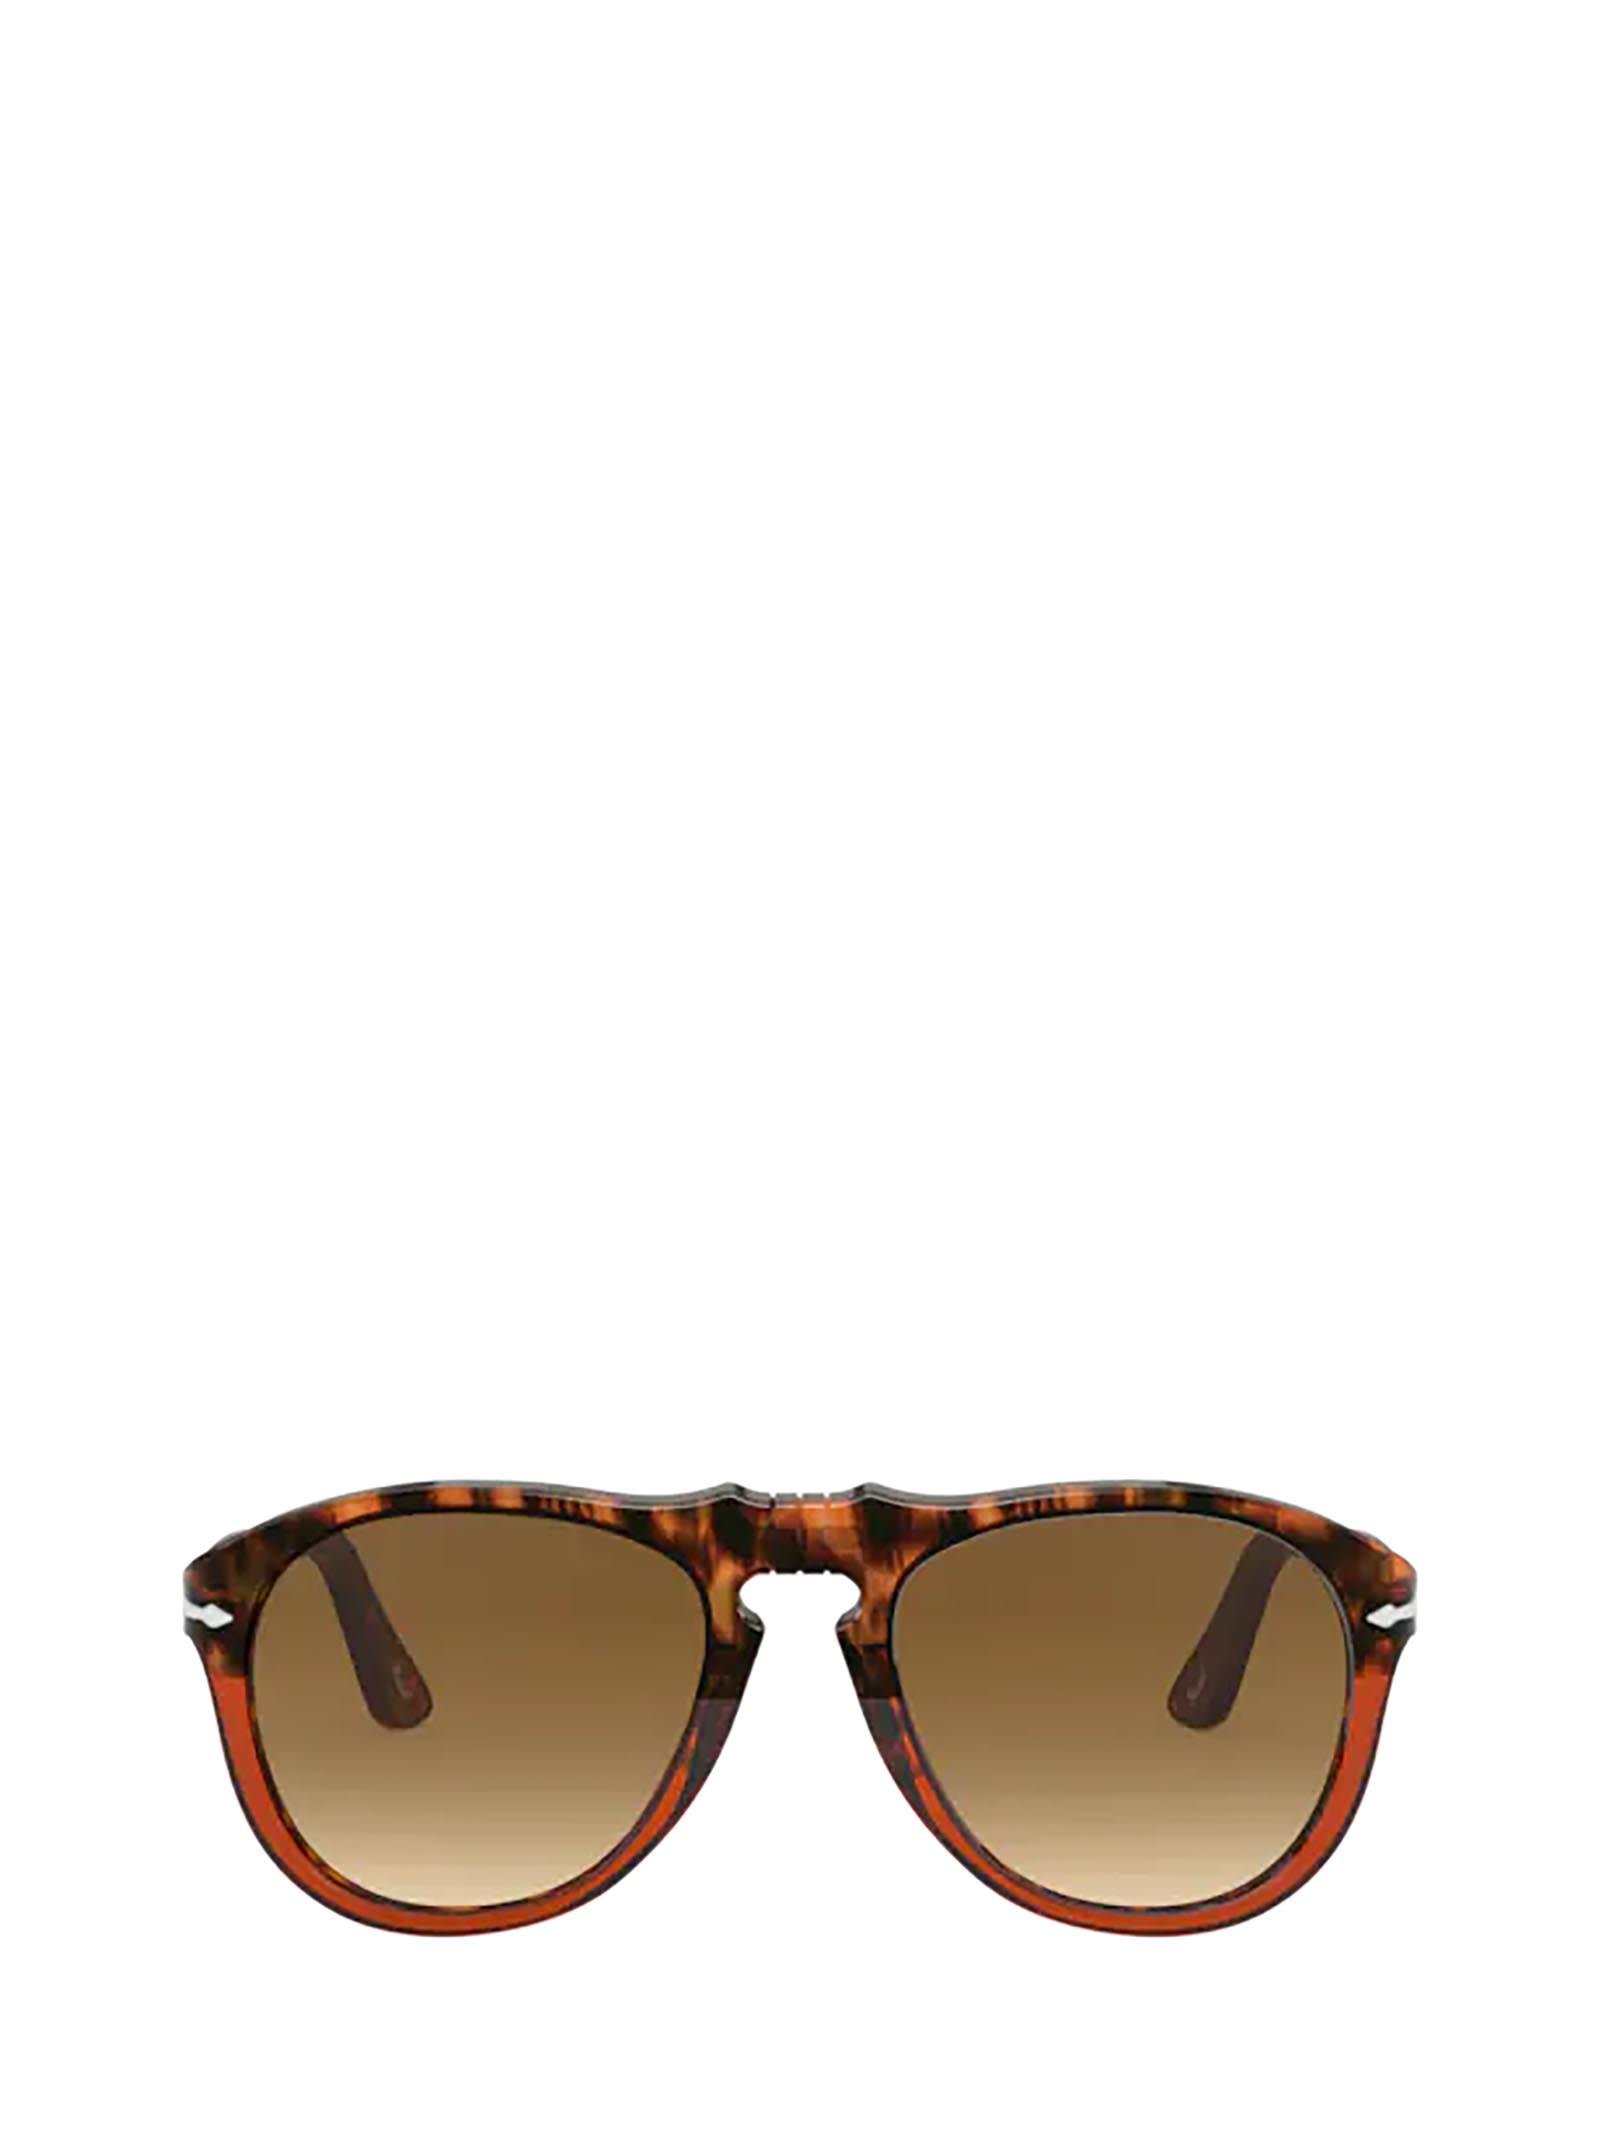 Persol Persol Po0649 Brown Tortoise/trasp Bordeaux Sunglasses